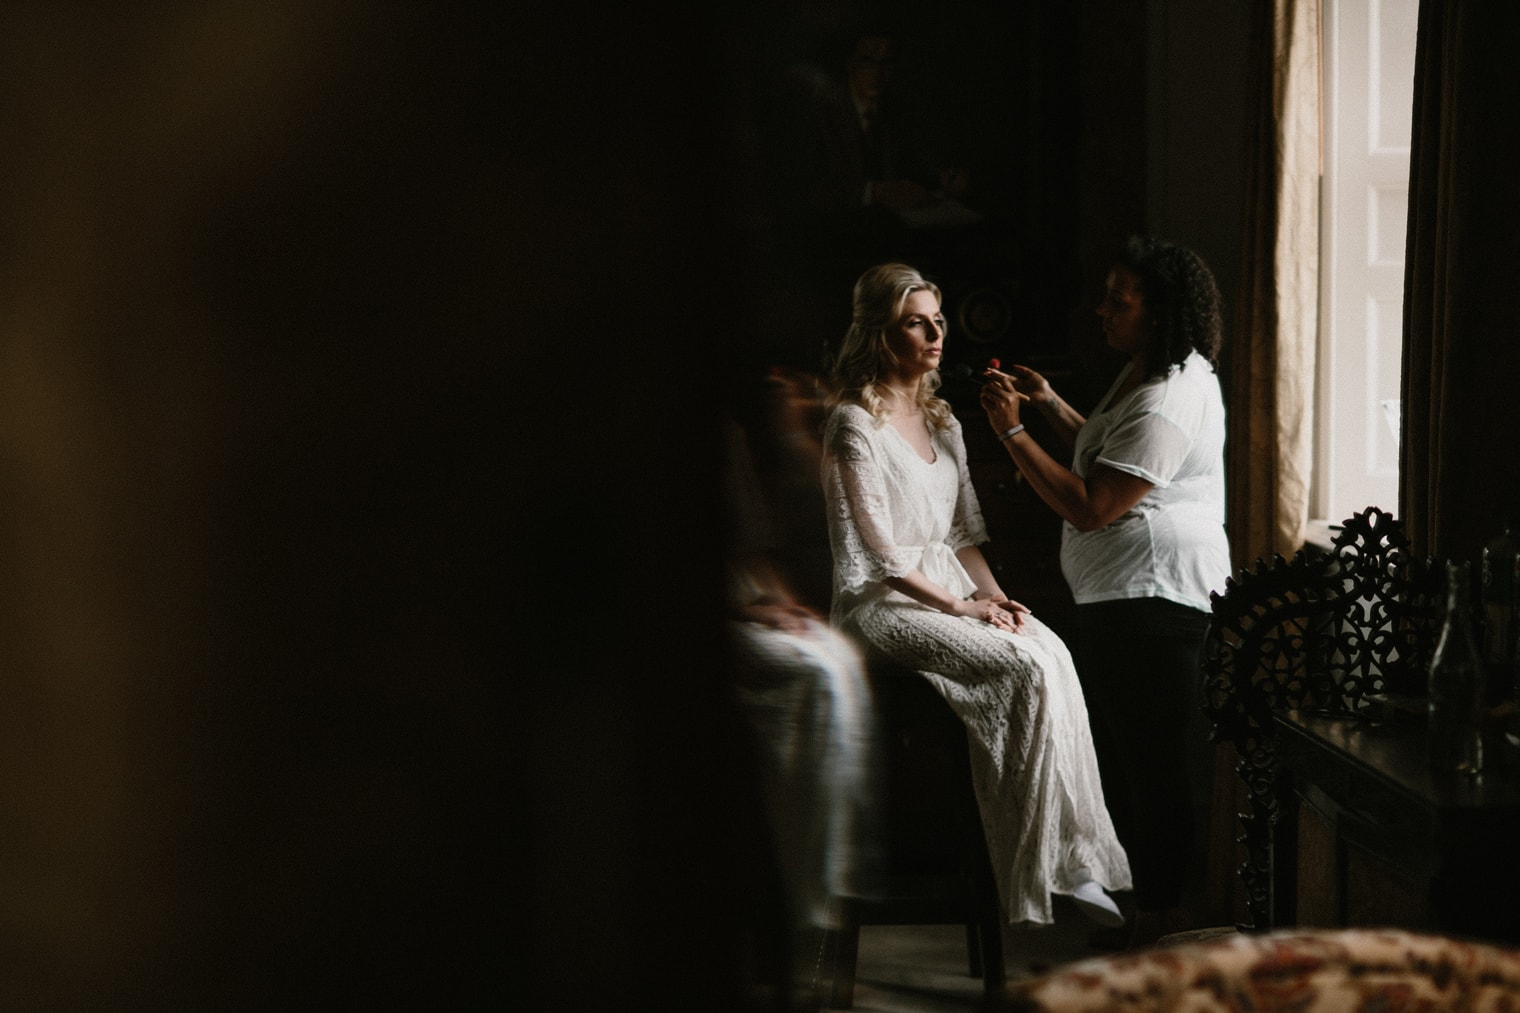 ireland bride, ireland wedding, ireland wedding photographer